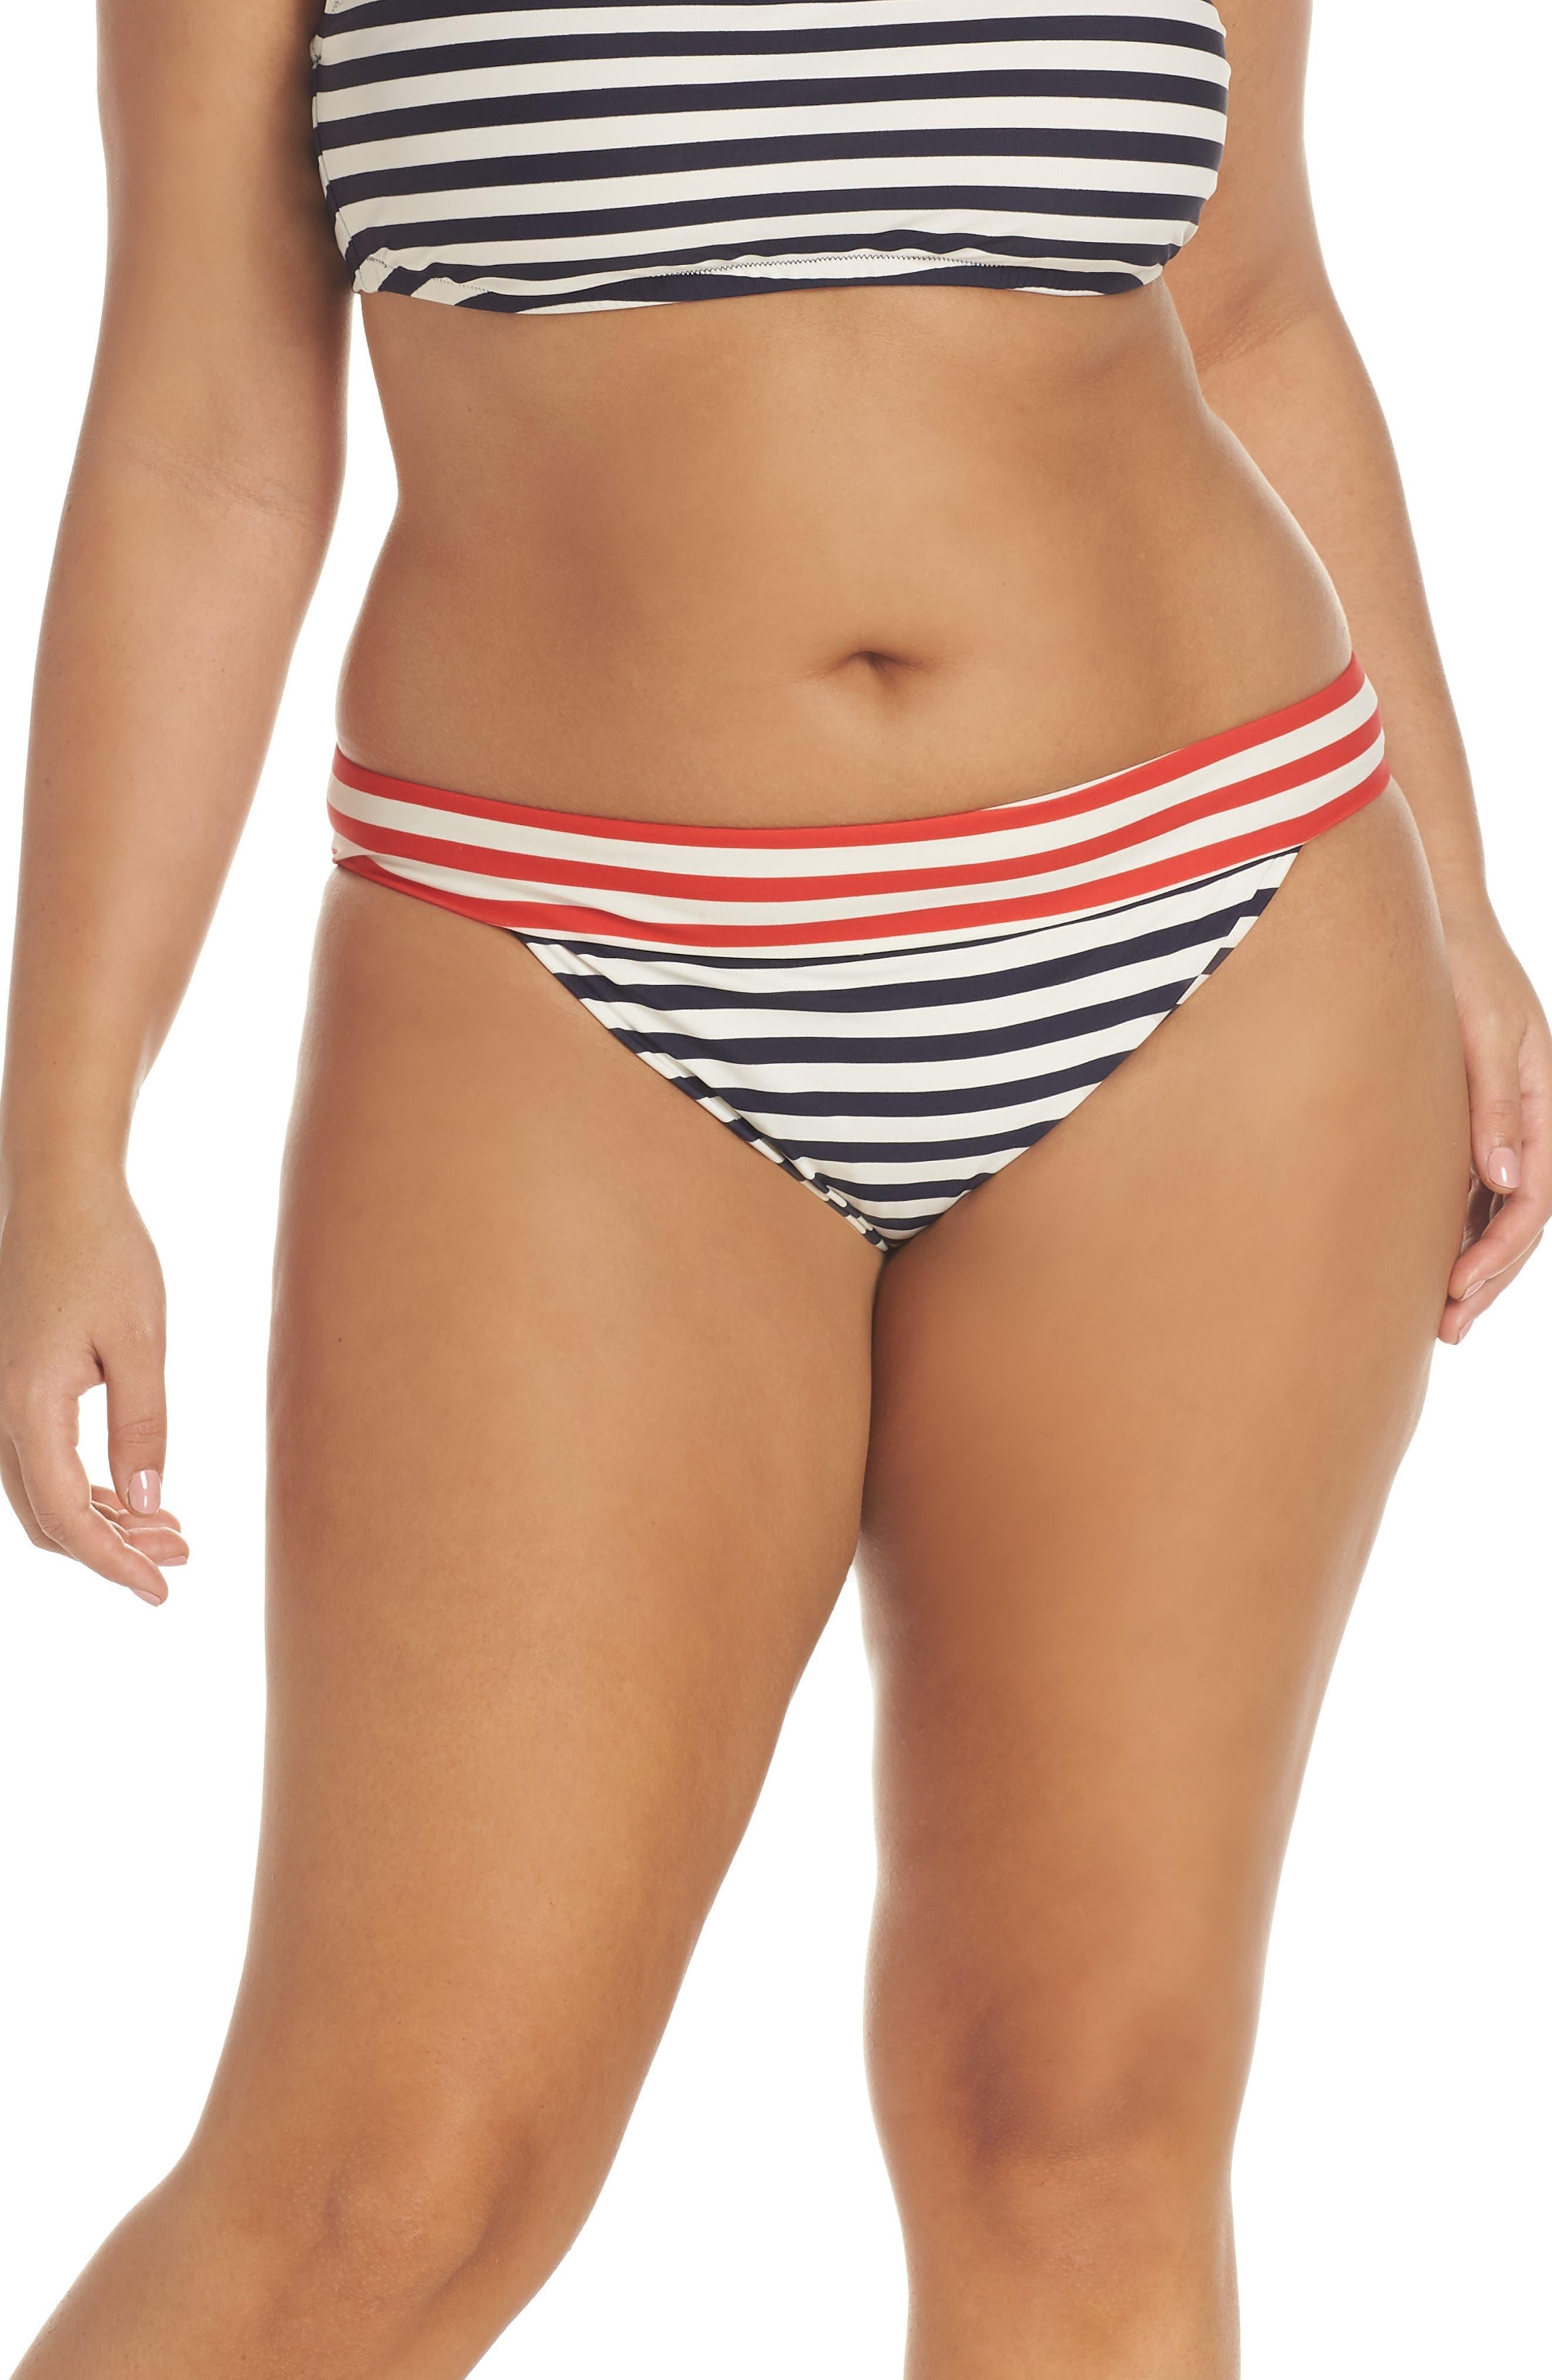 Stripe Banded Bikini Bottoms,                         Main,                         color, NAVY VIVID FLAME